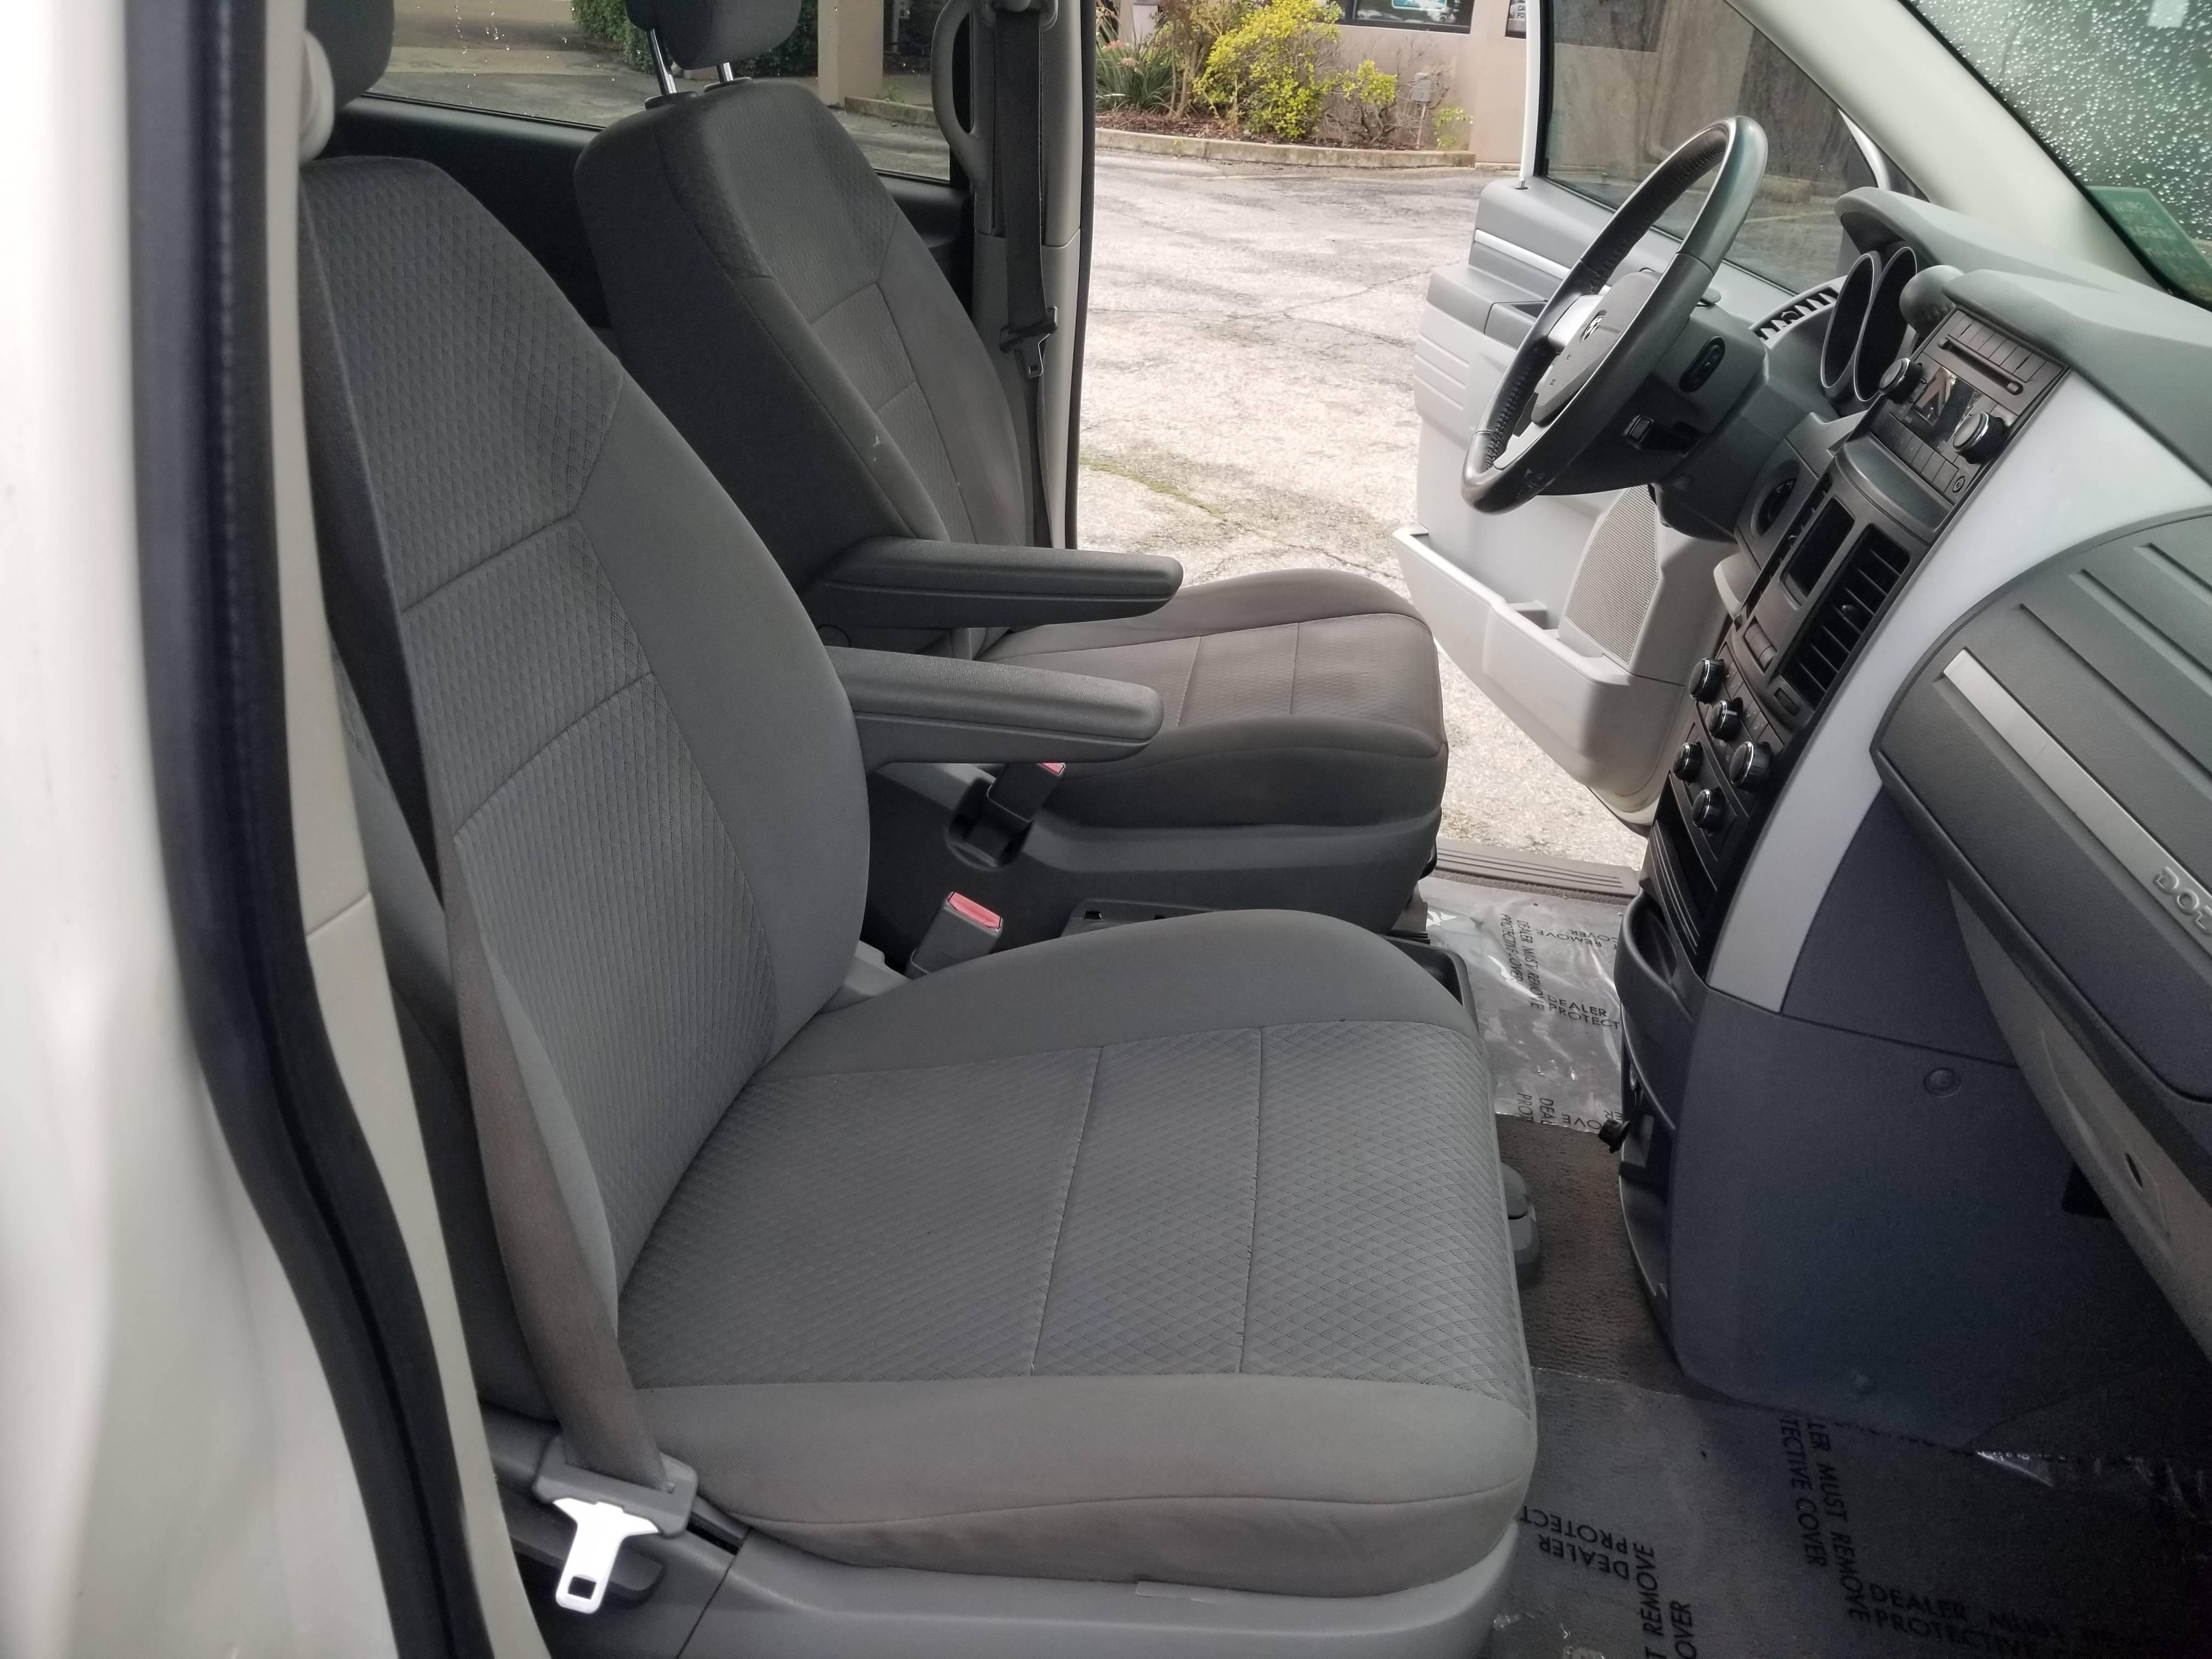 used vehicle - Passenger Van DODGE GRAND CARAVAN 2010